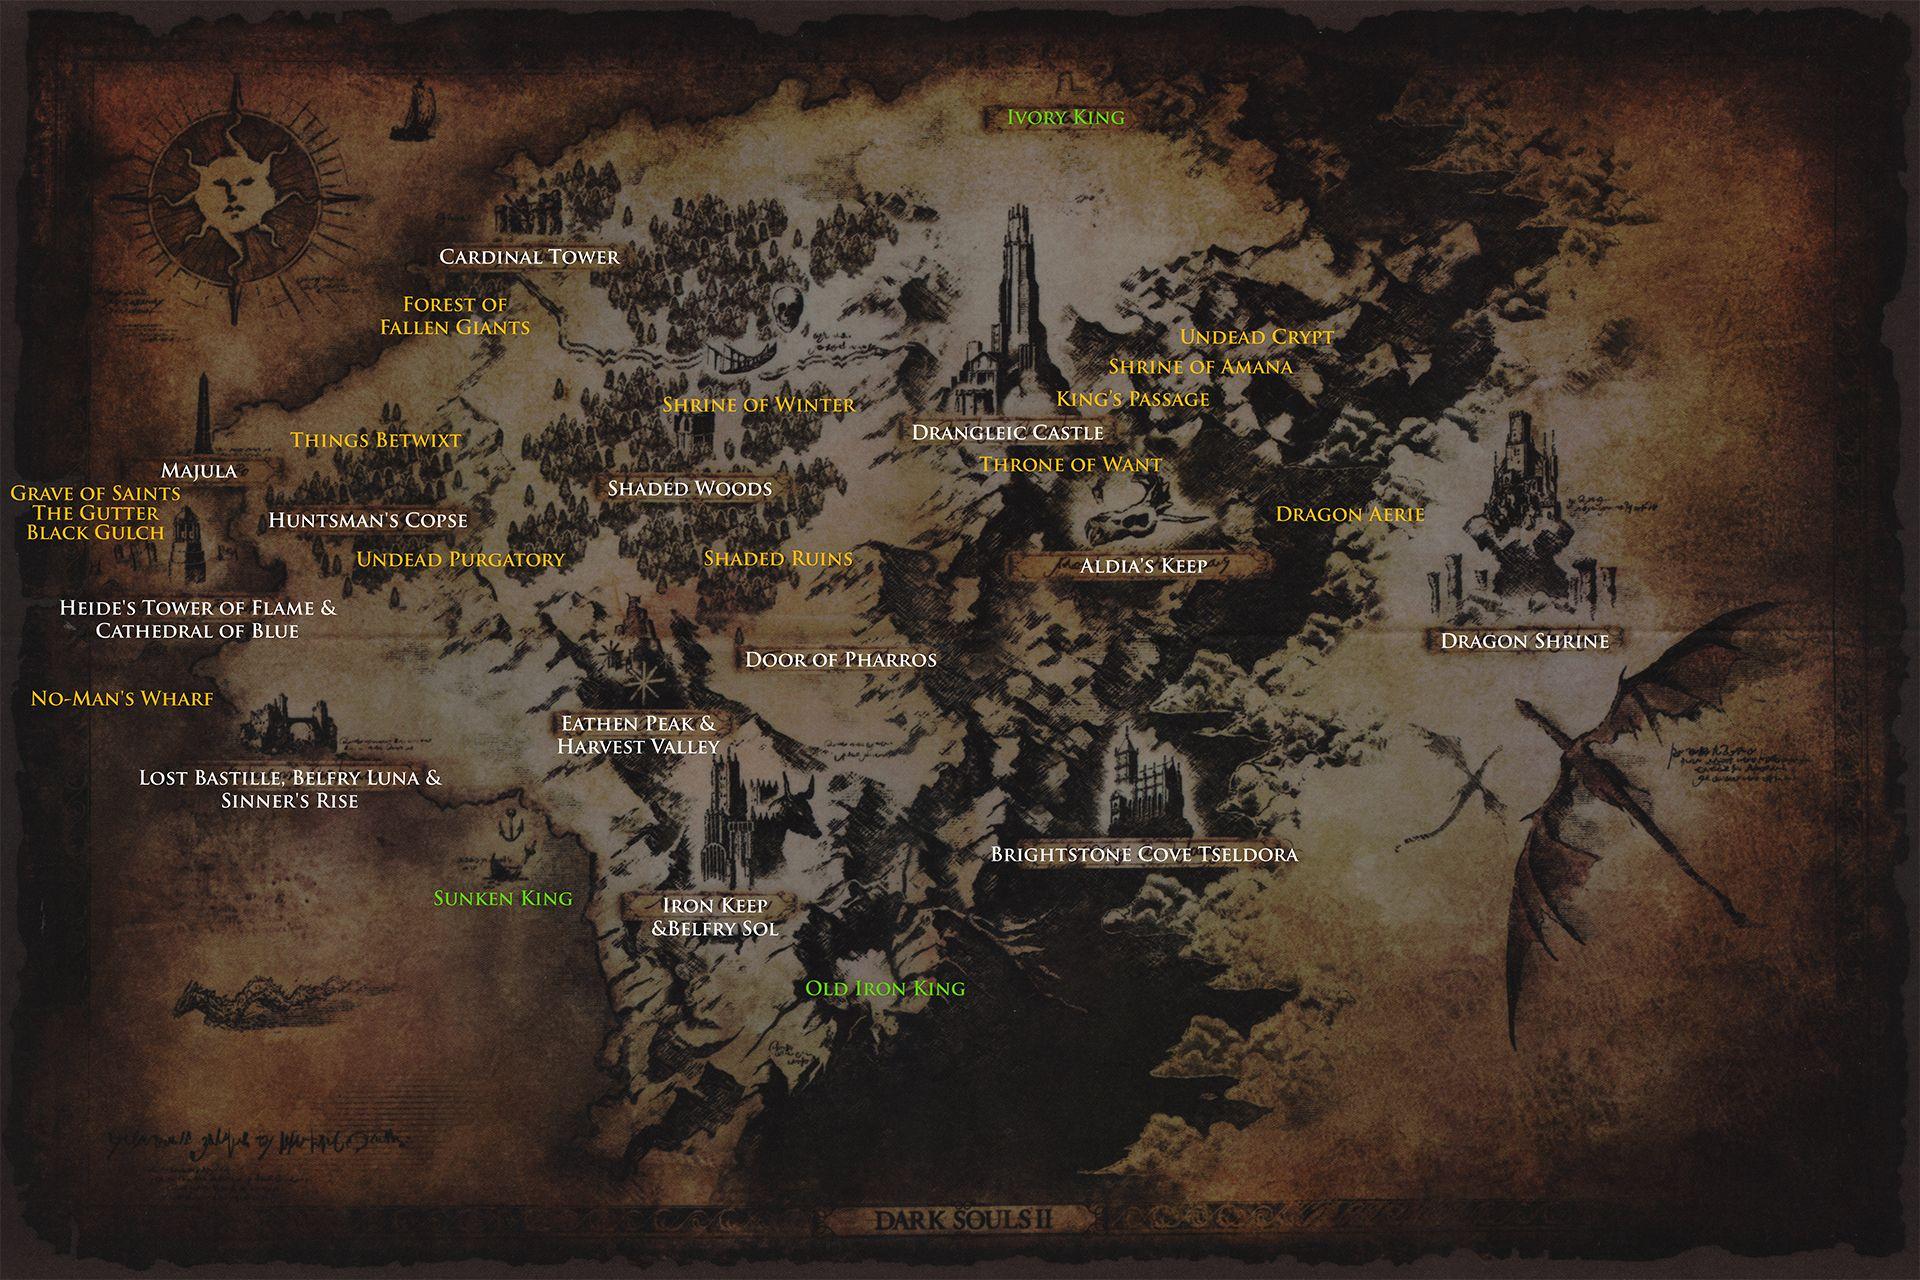 Dark Souls 2 World Map drangleic_map_dlc. (1920×1280) (With images) | Dark souls, Dark